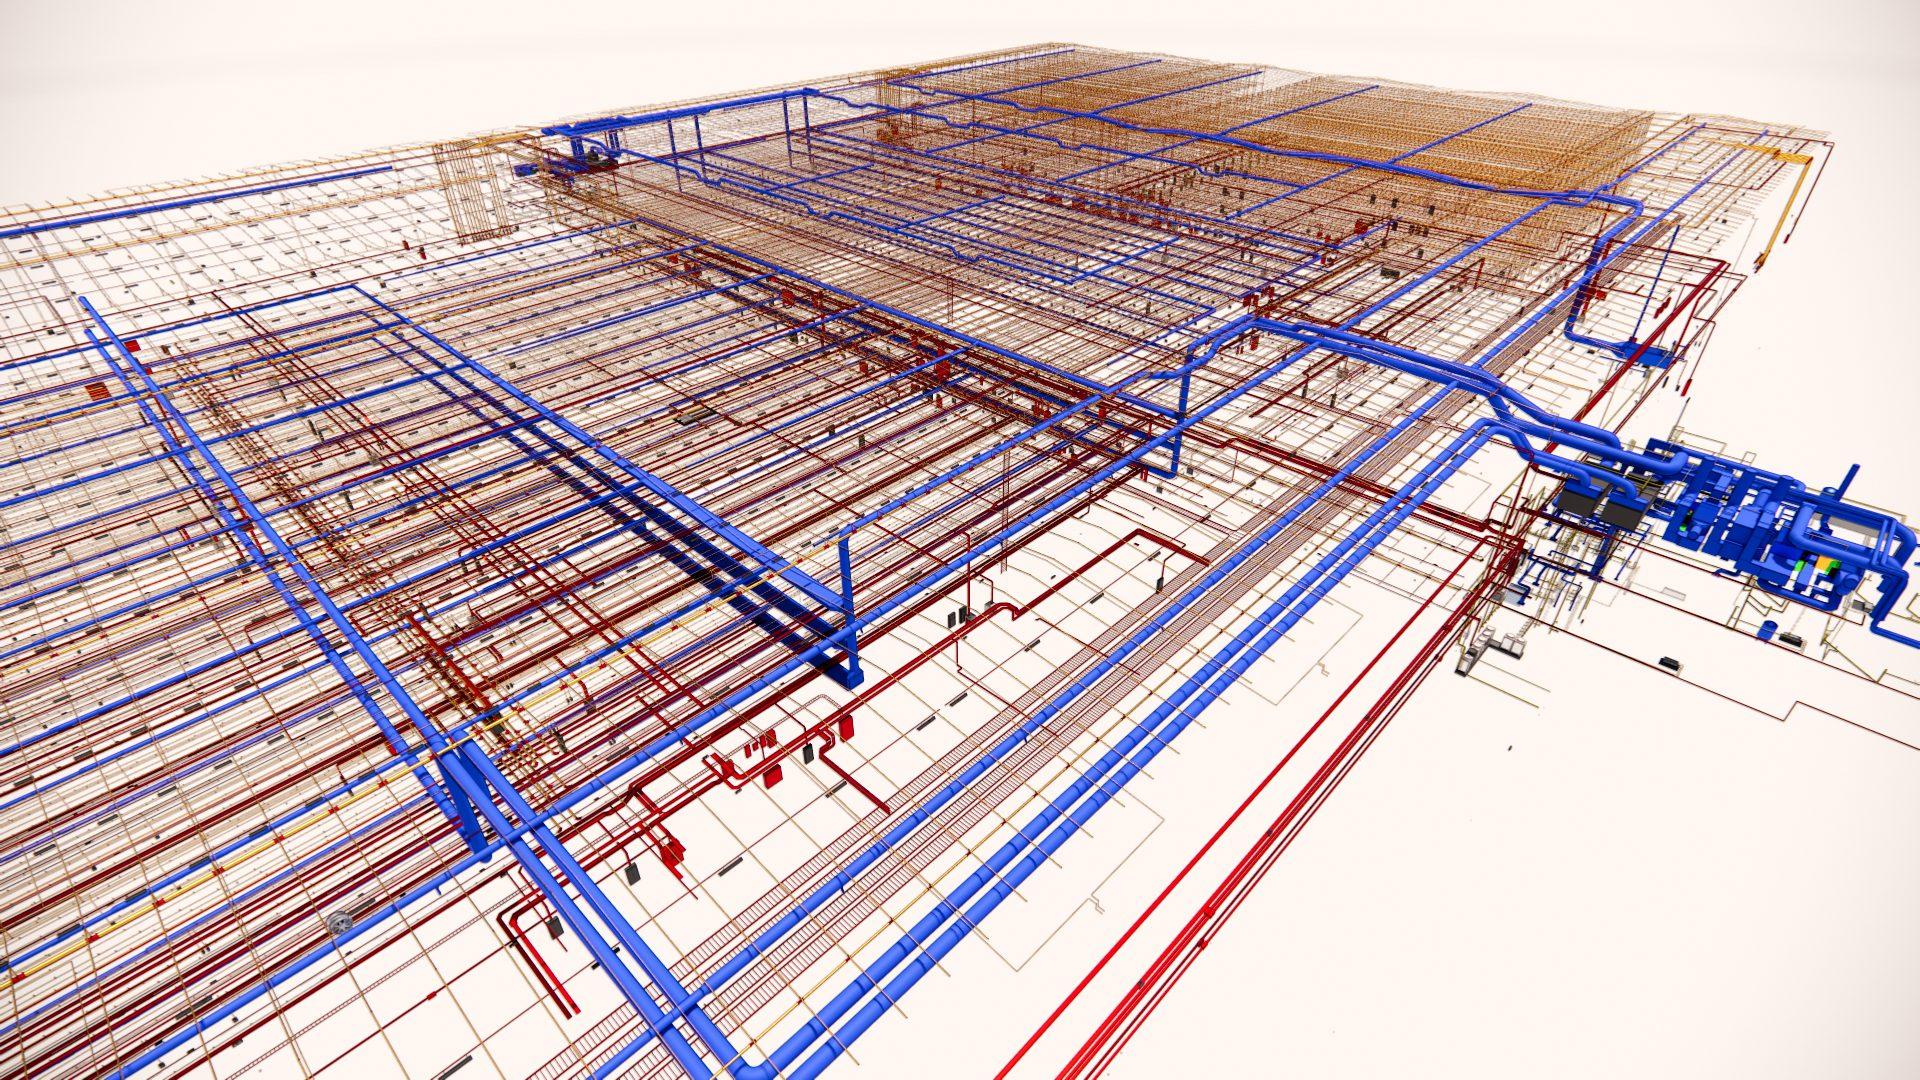 H&M Distribution Warehouse rendering